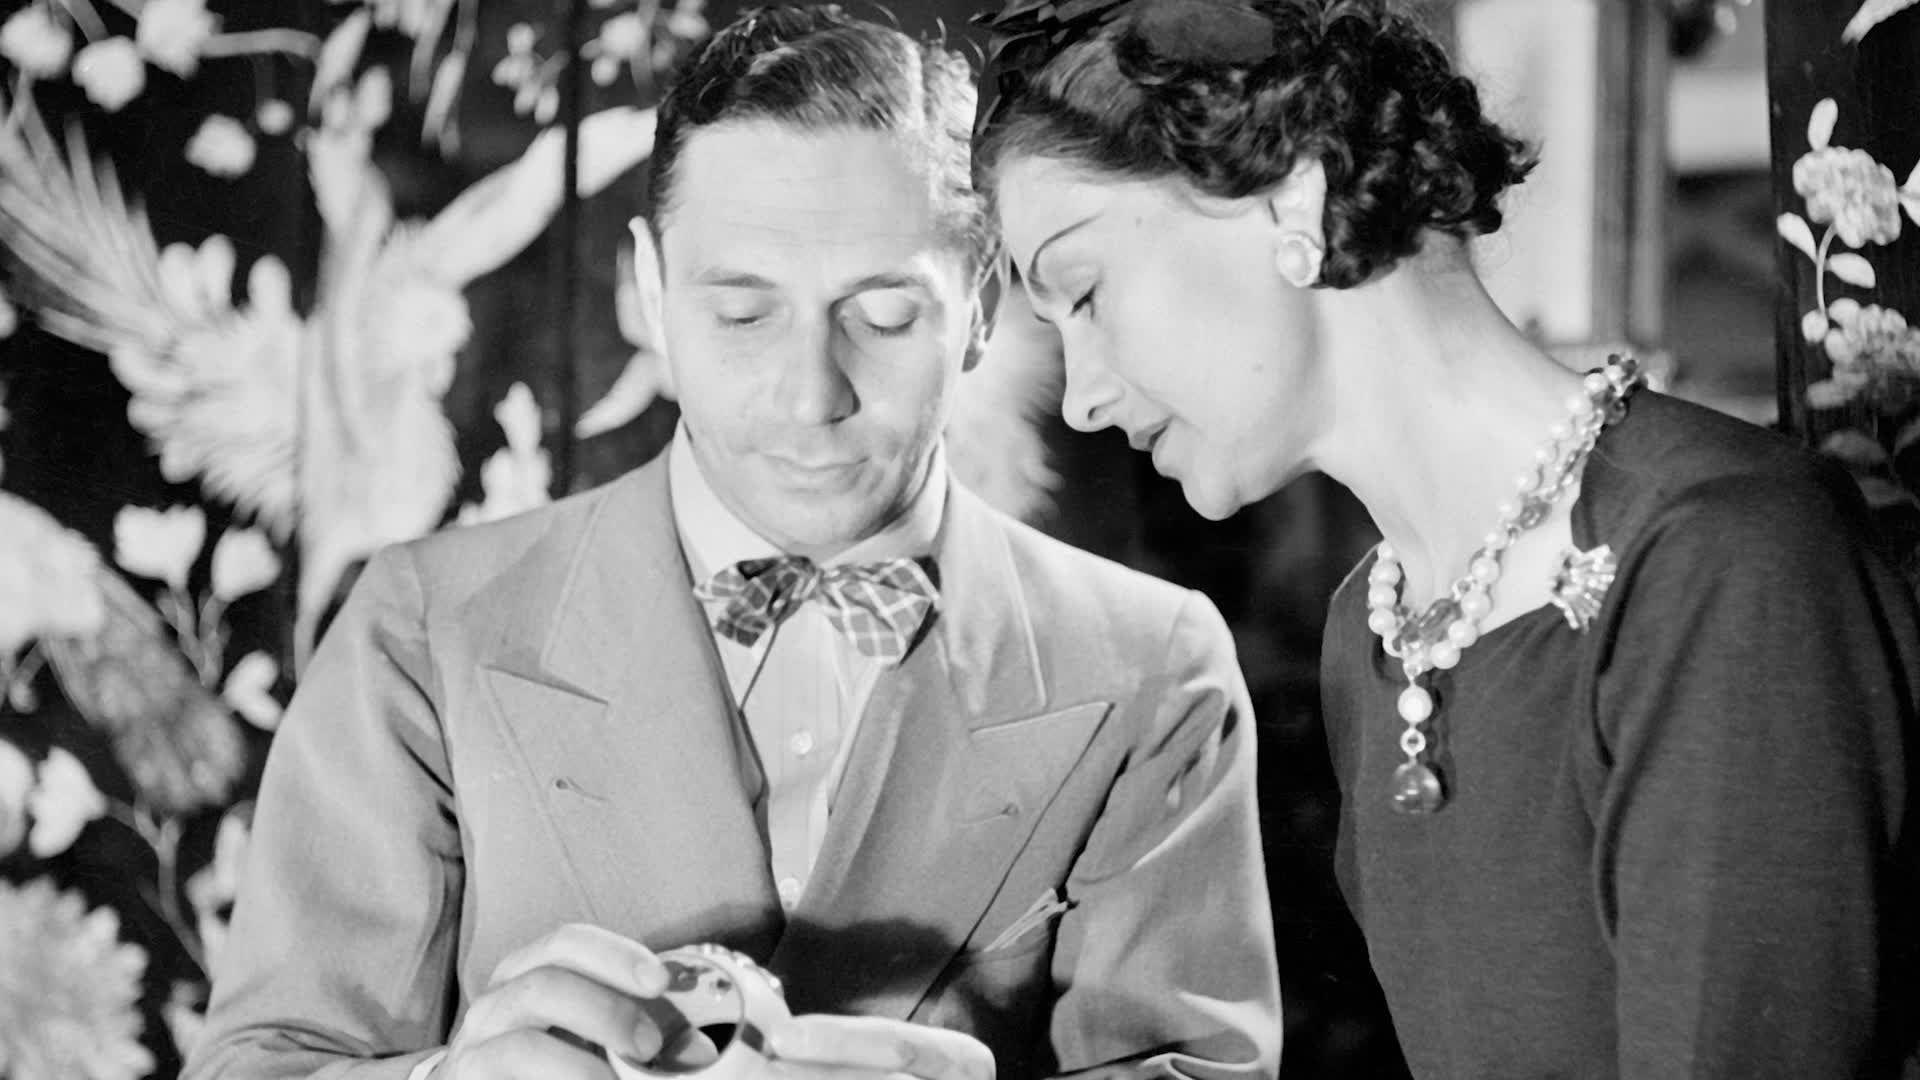 The Fascinating Life of Jewelry Designer Fulco Di Verdura